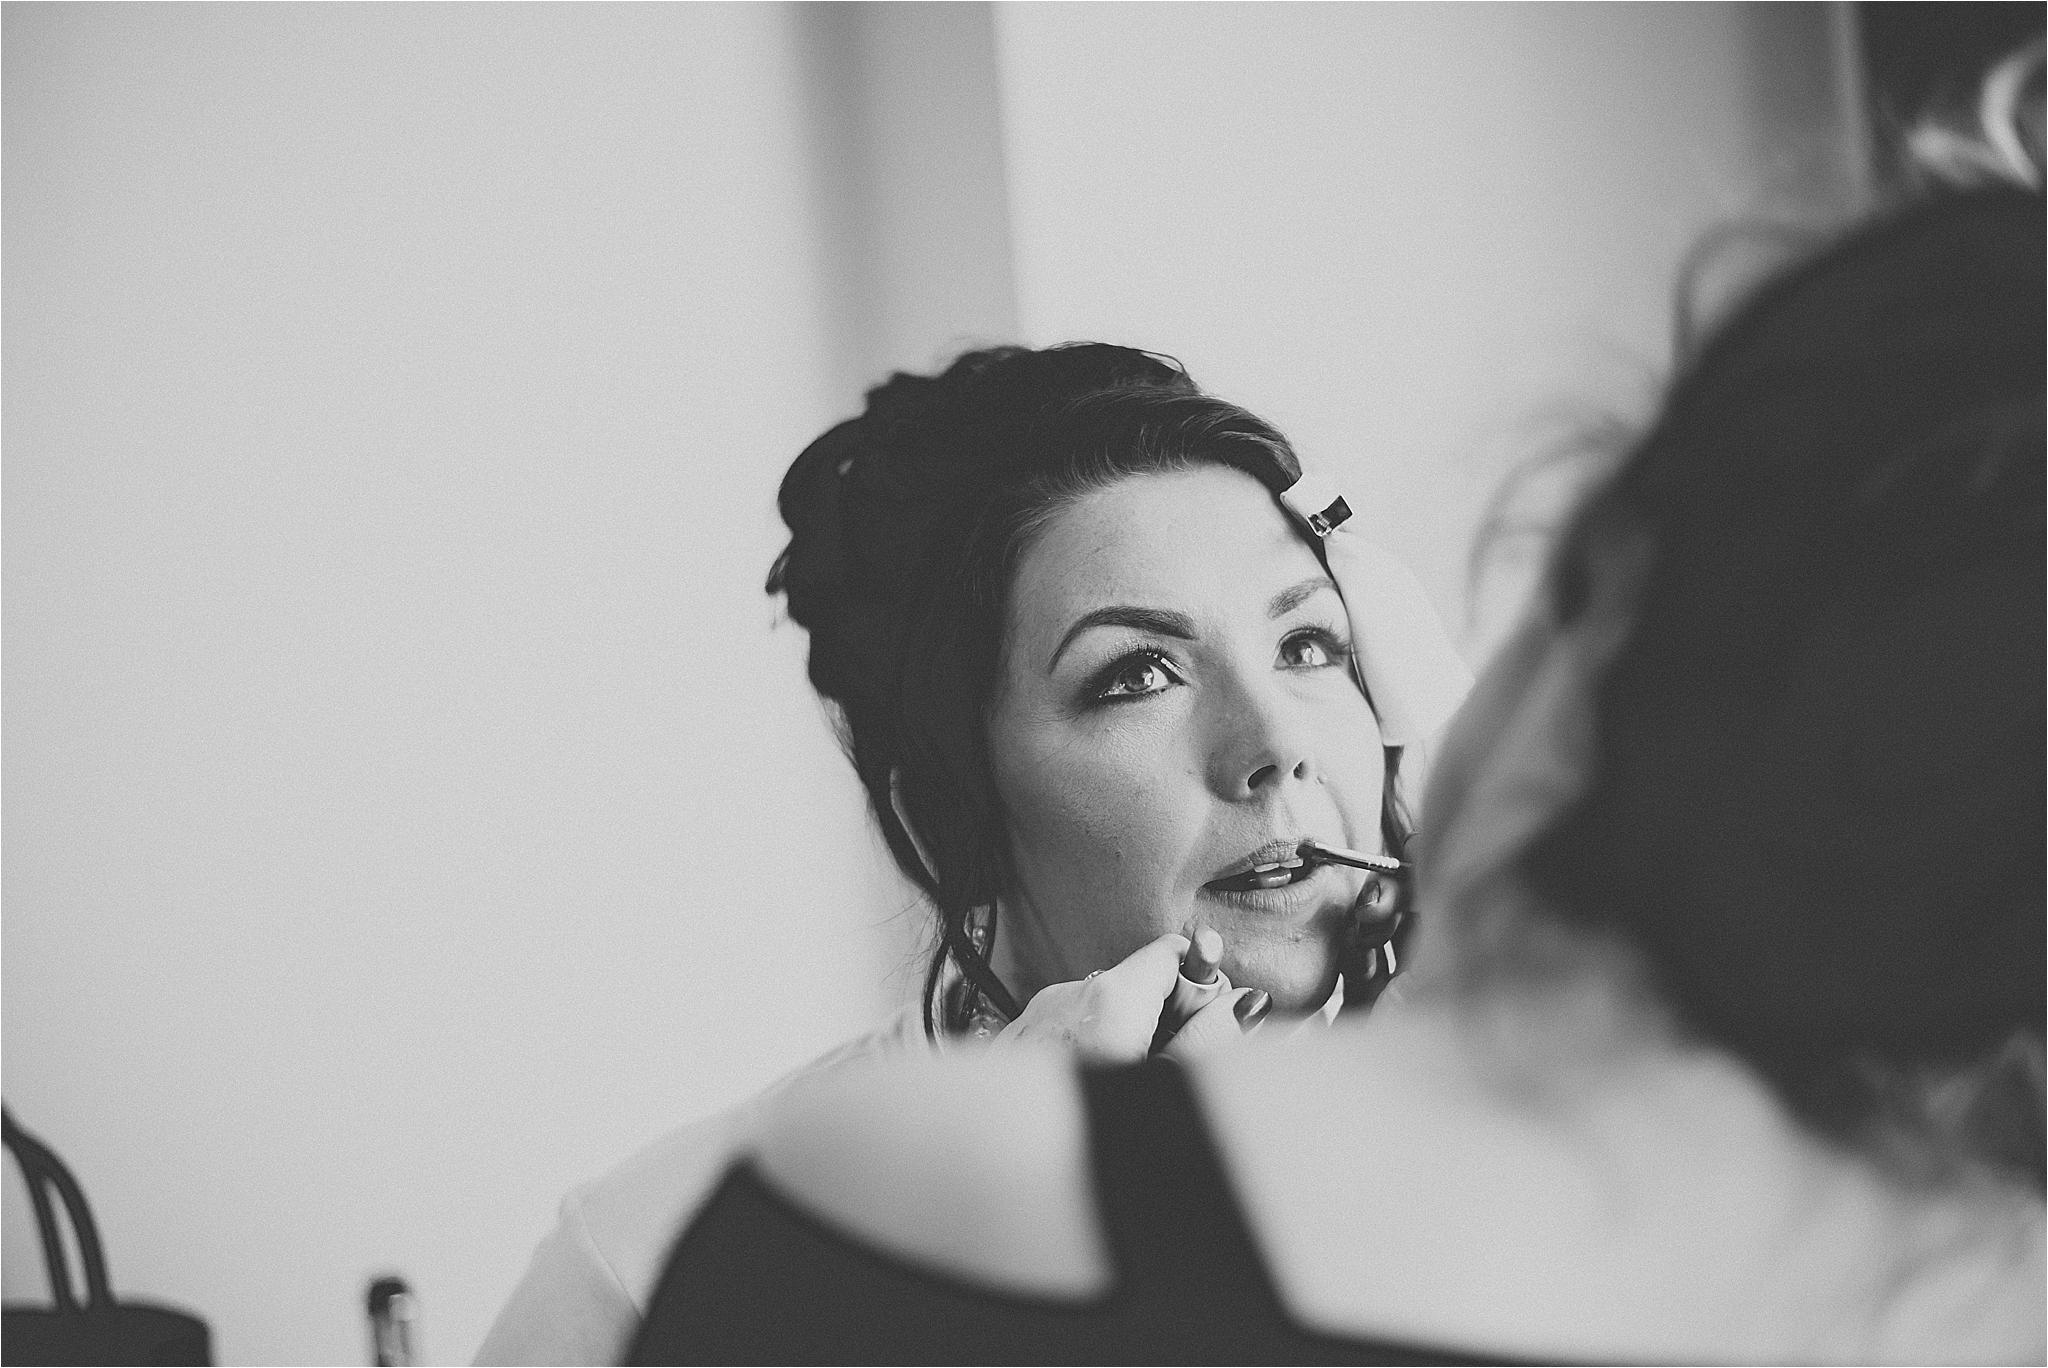 thevilla+lancashire+wreagreen+wedding+photographer14.jpg